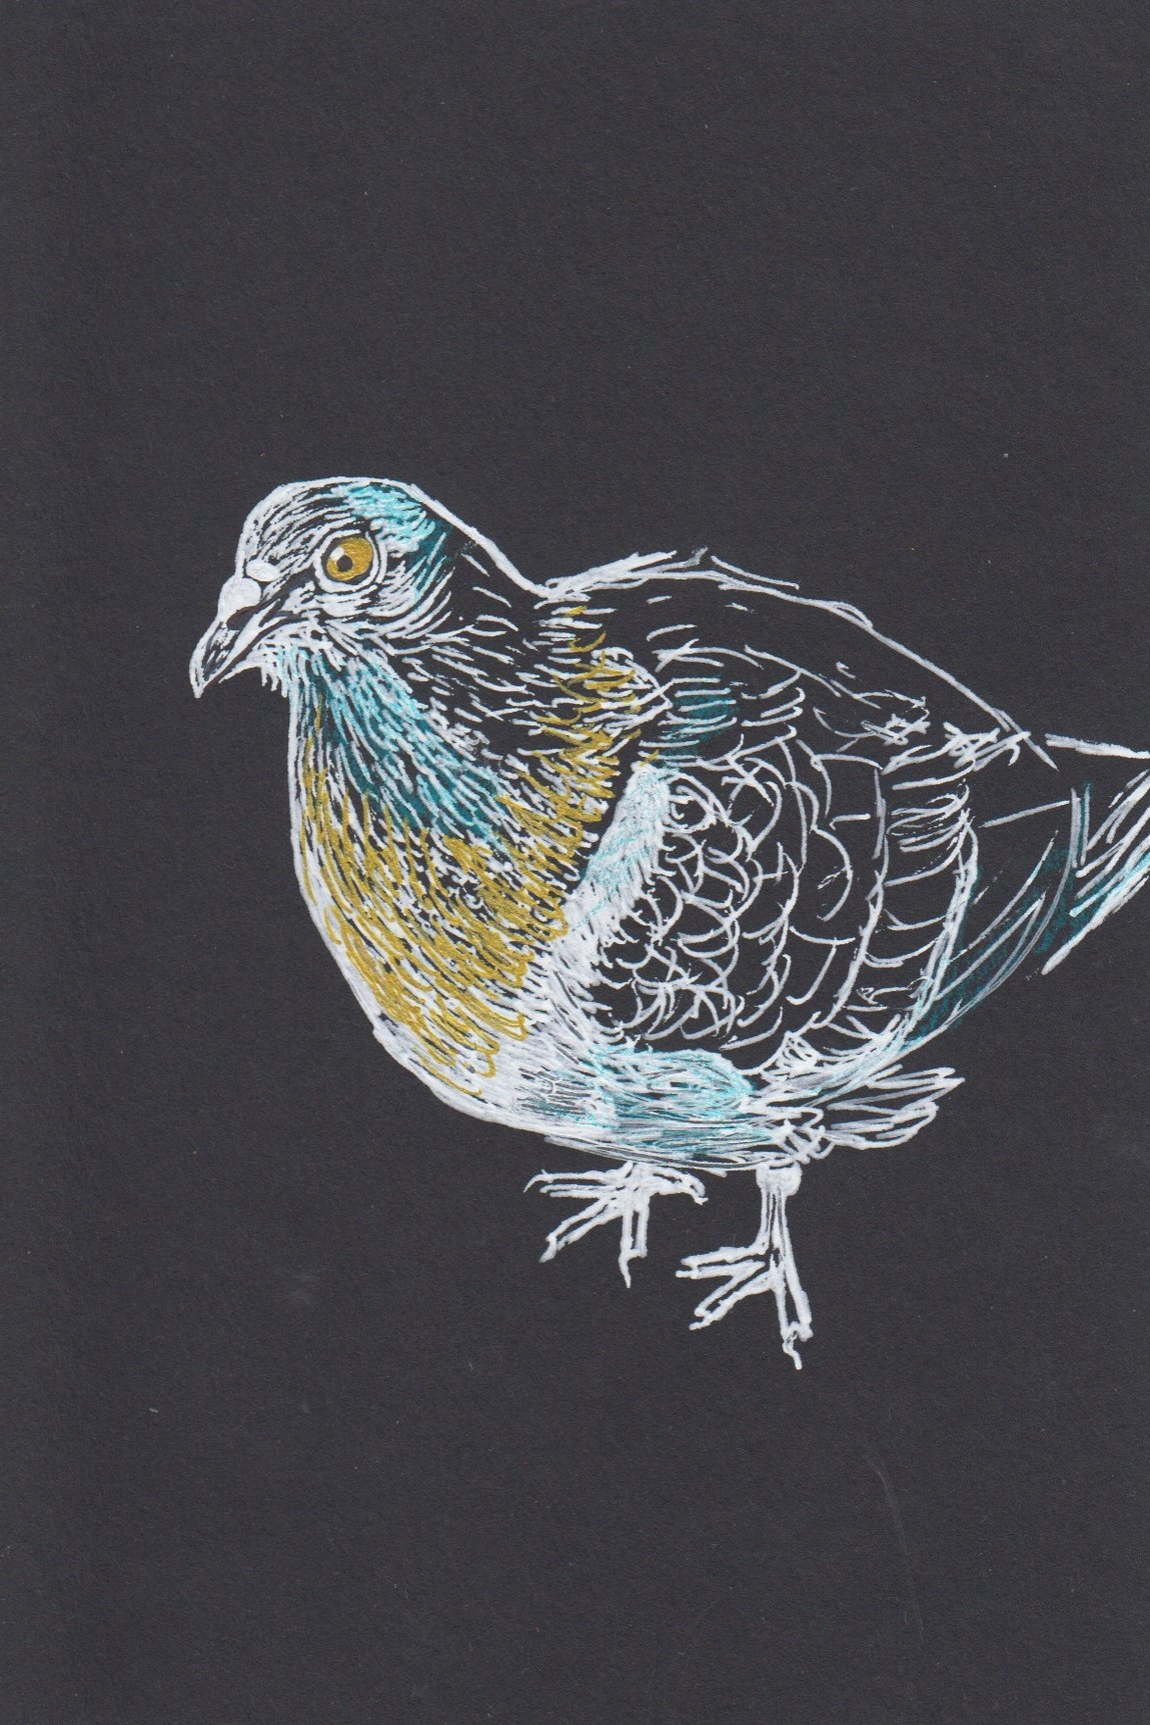 Pigeon 4.jpg